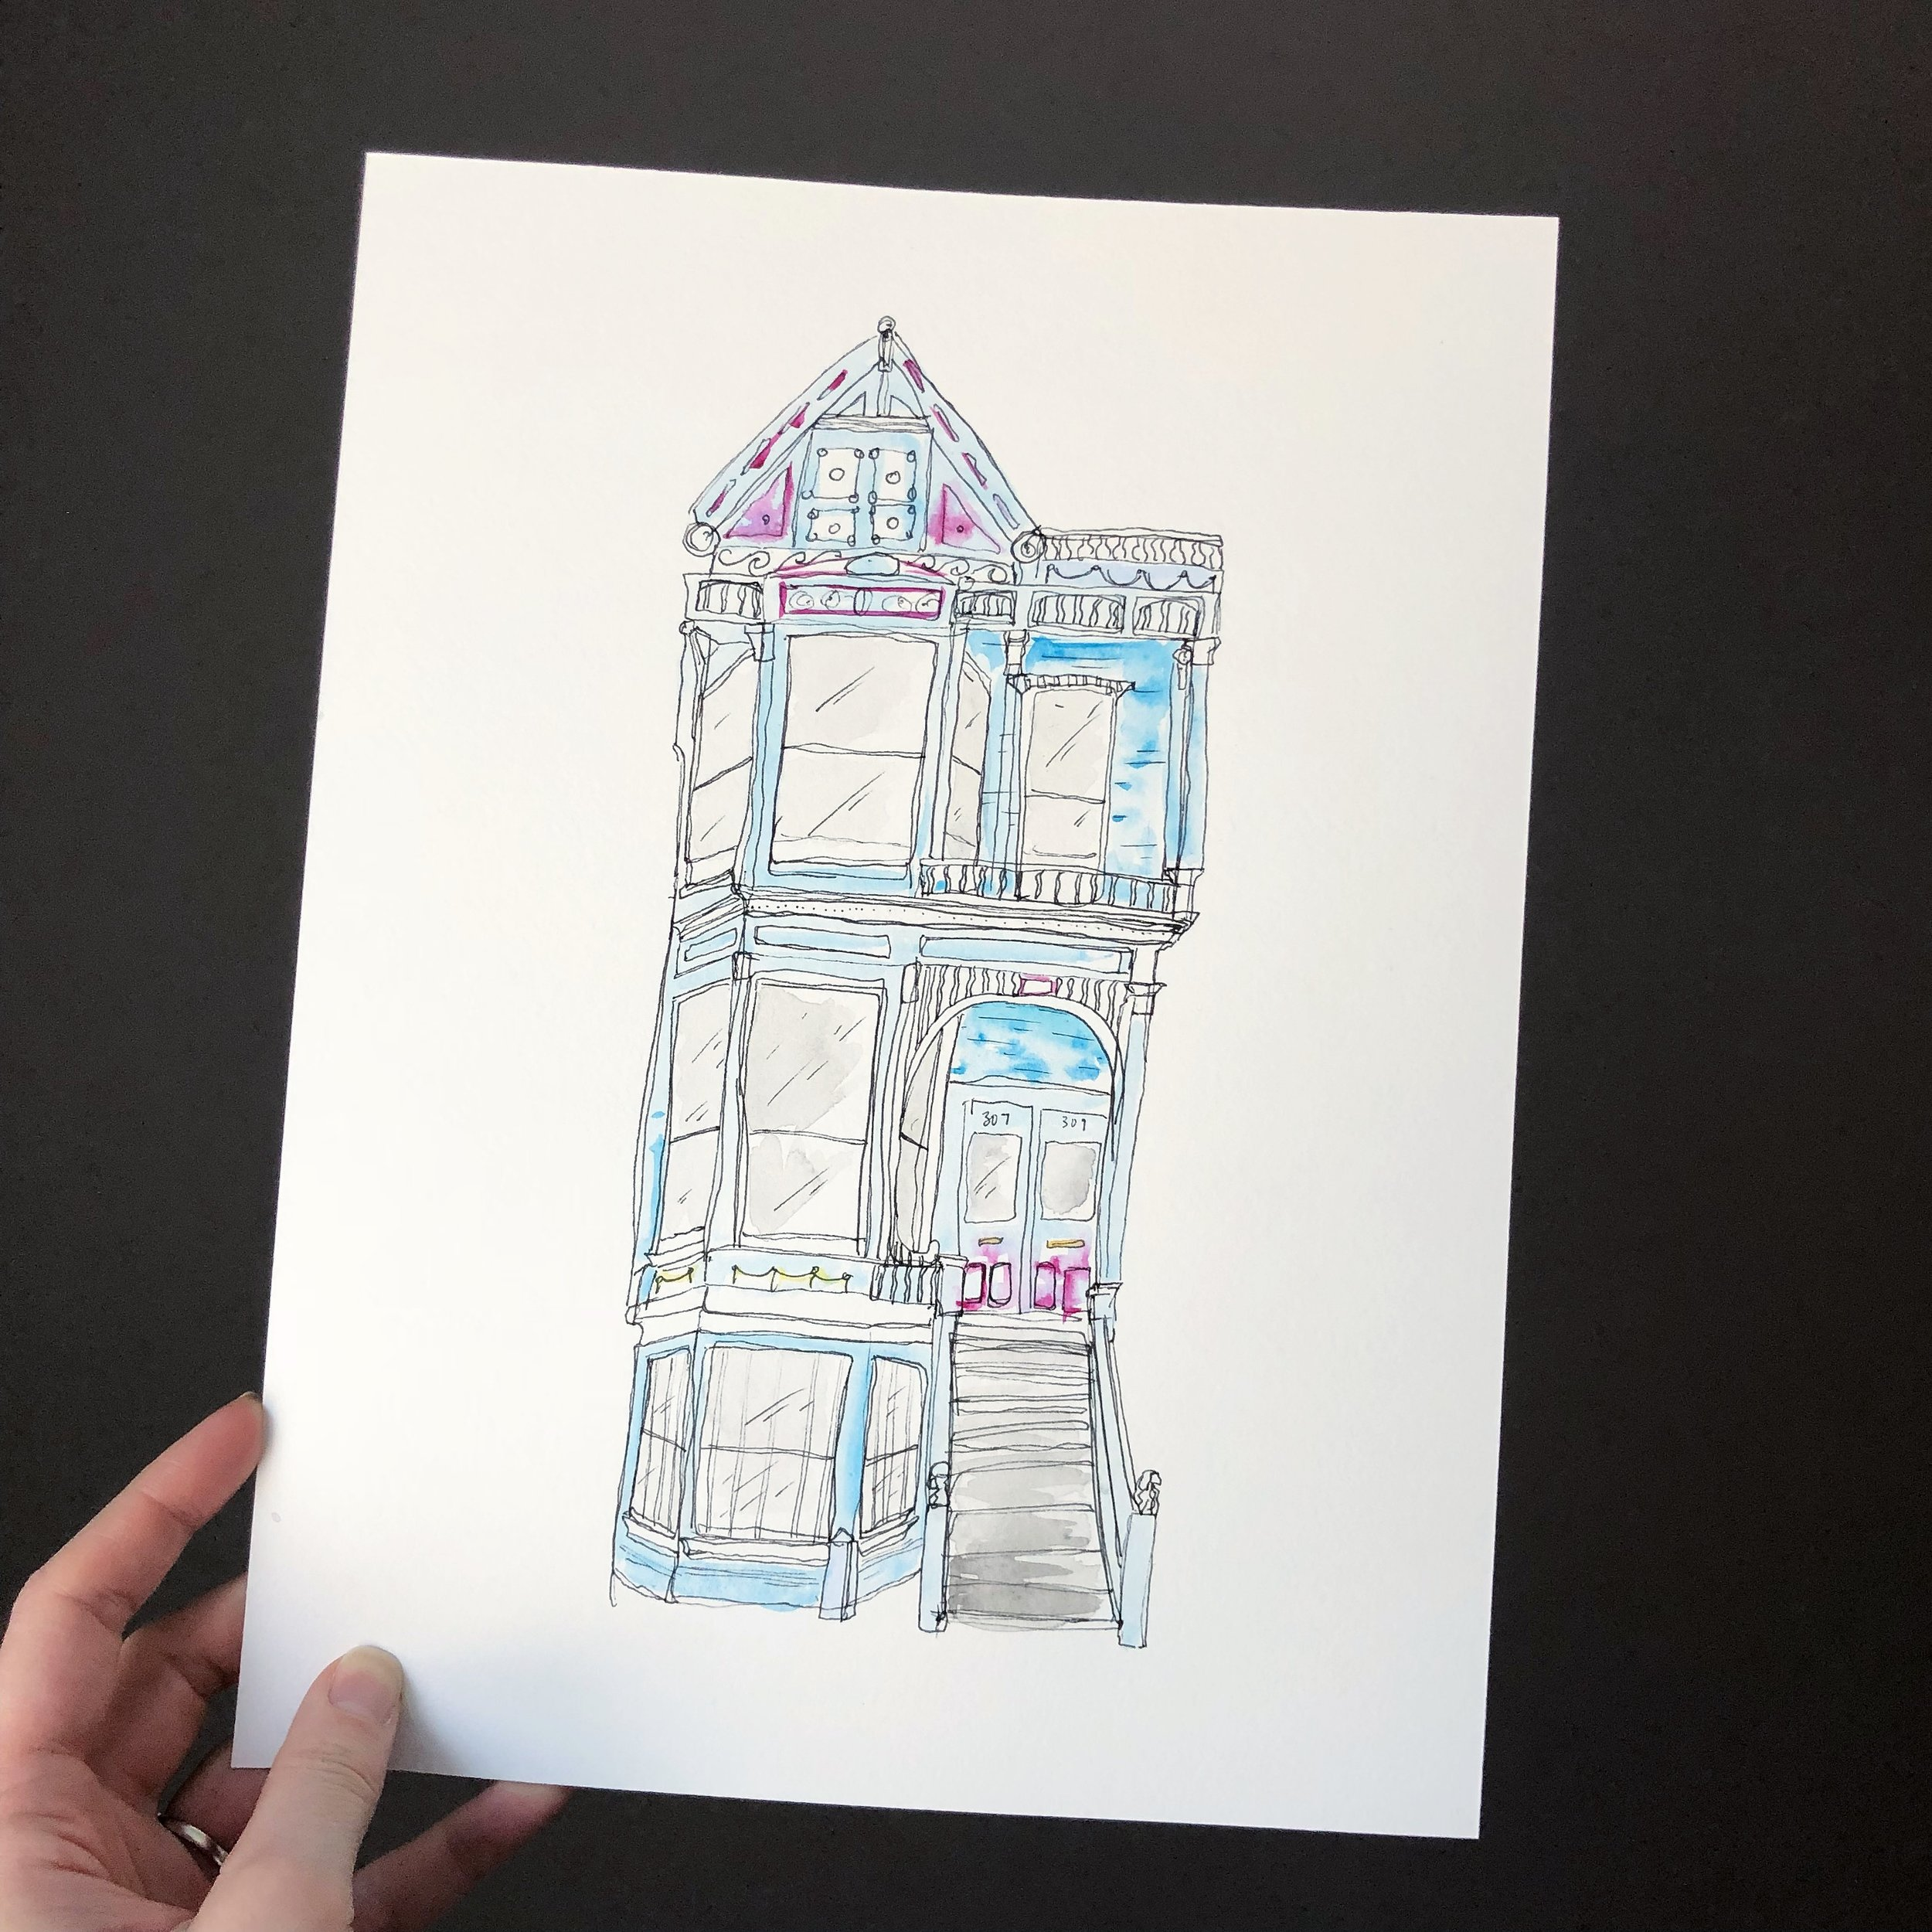 home-sketch-sanfrancisco.jpg